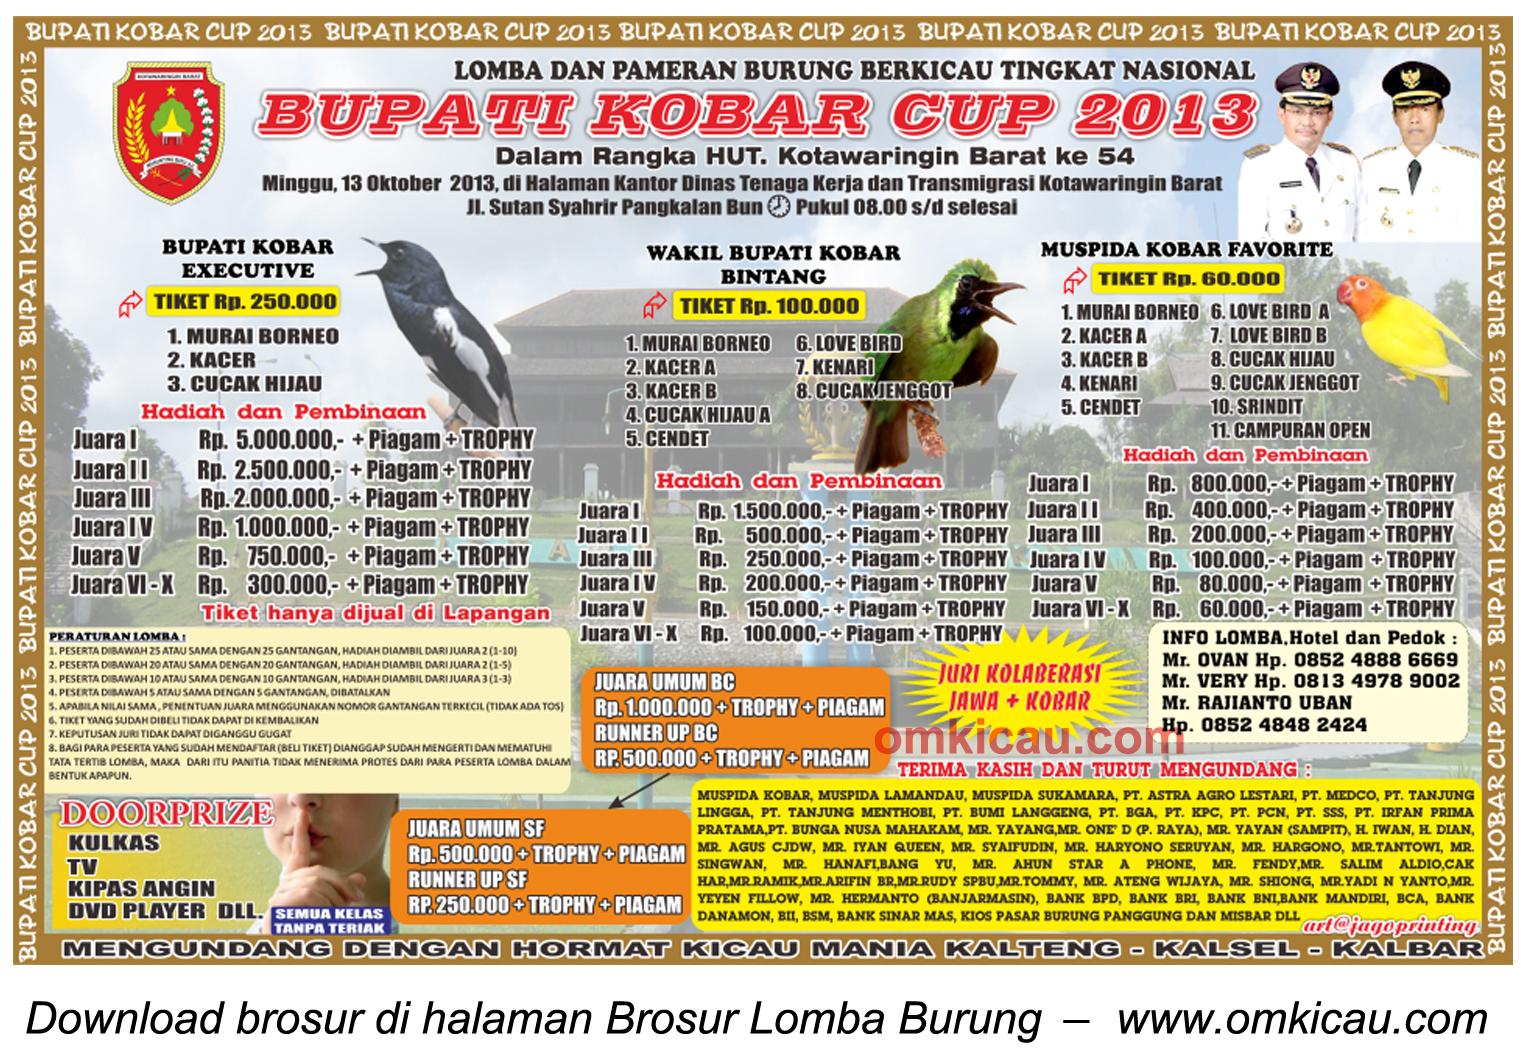 Brosur Lomba Burung Bupati Kobar Cup, Kotawaringin Barat, 13 Oktober 2013